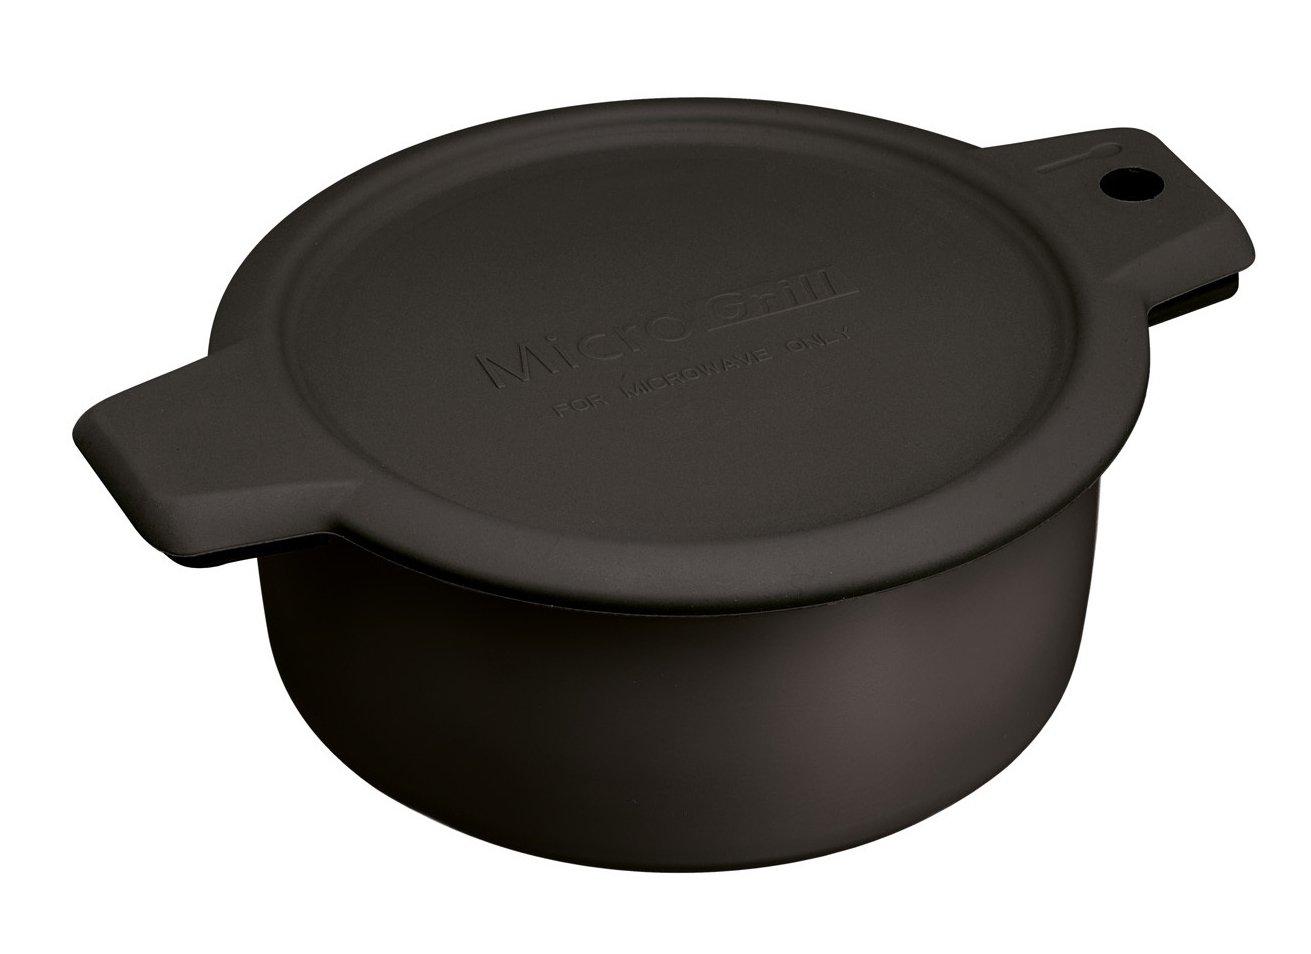 Kitchencraft Aluminium Microwave Browning Dish 1 5 Litre